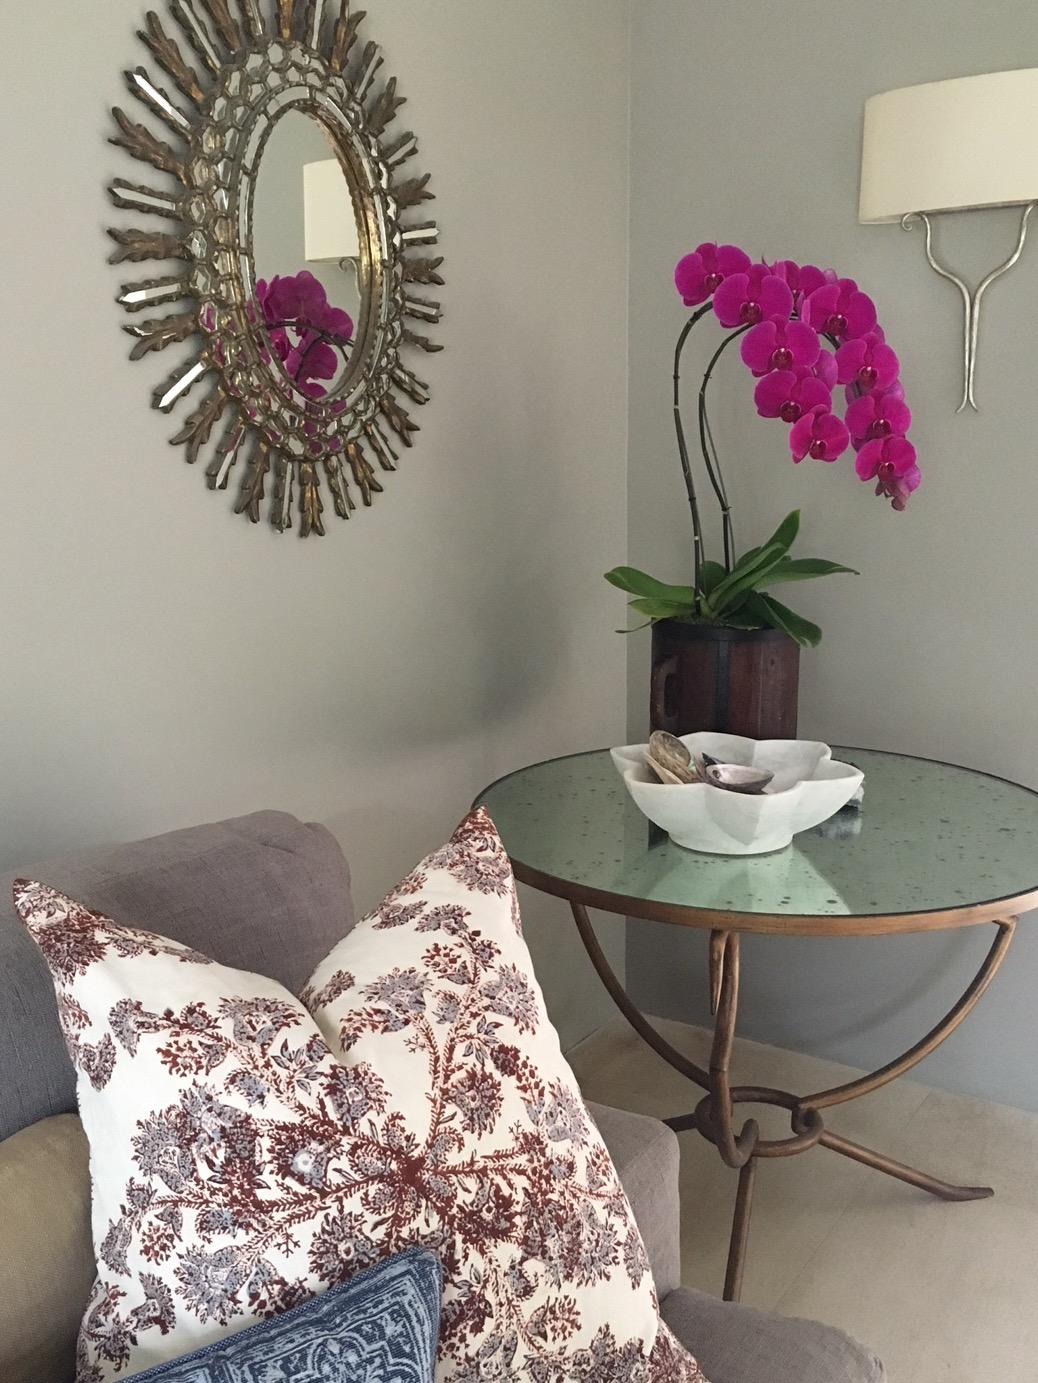 Grawski pink orchids